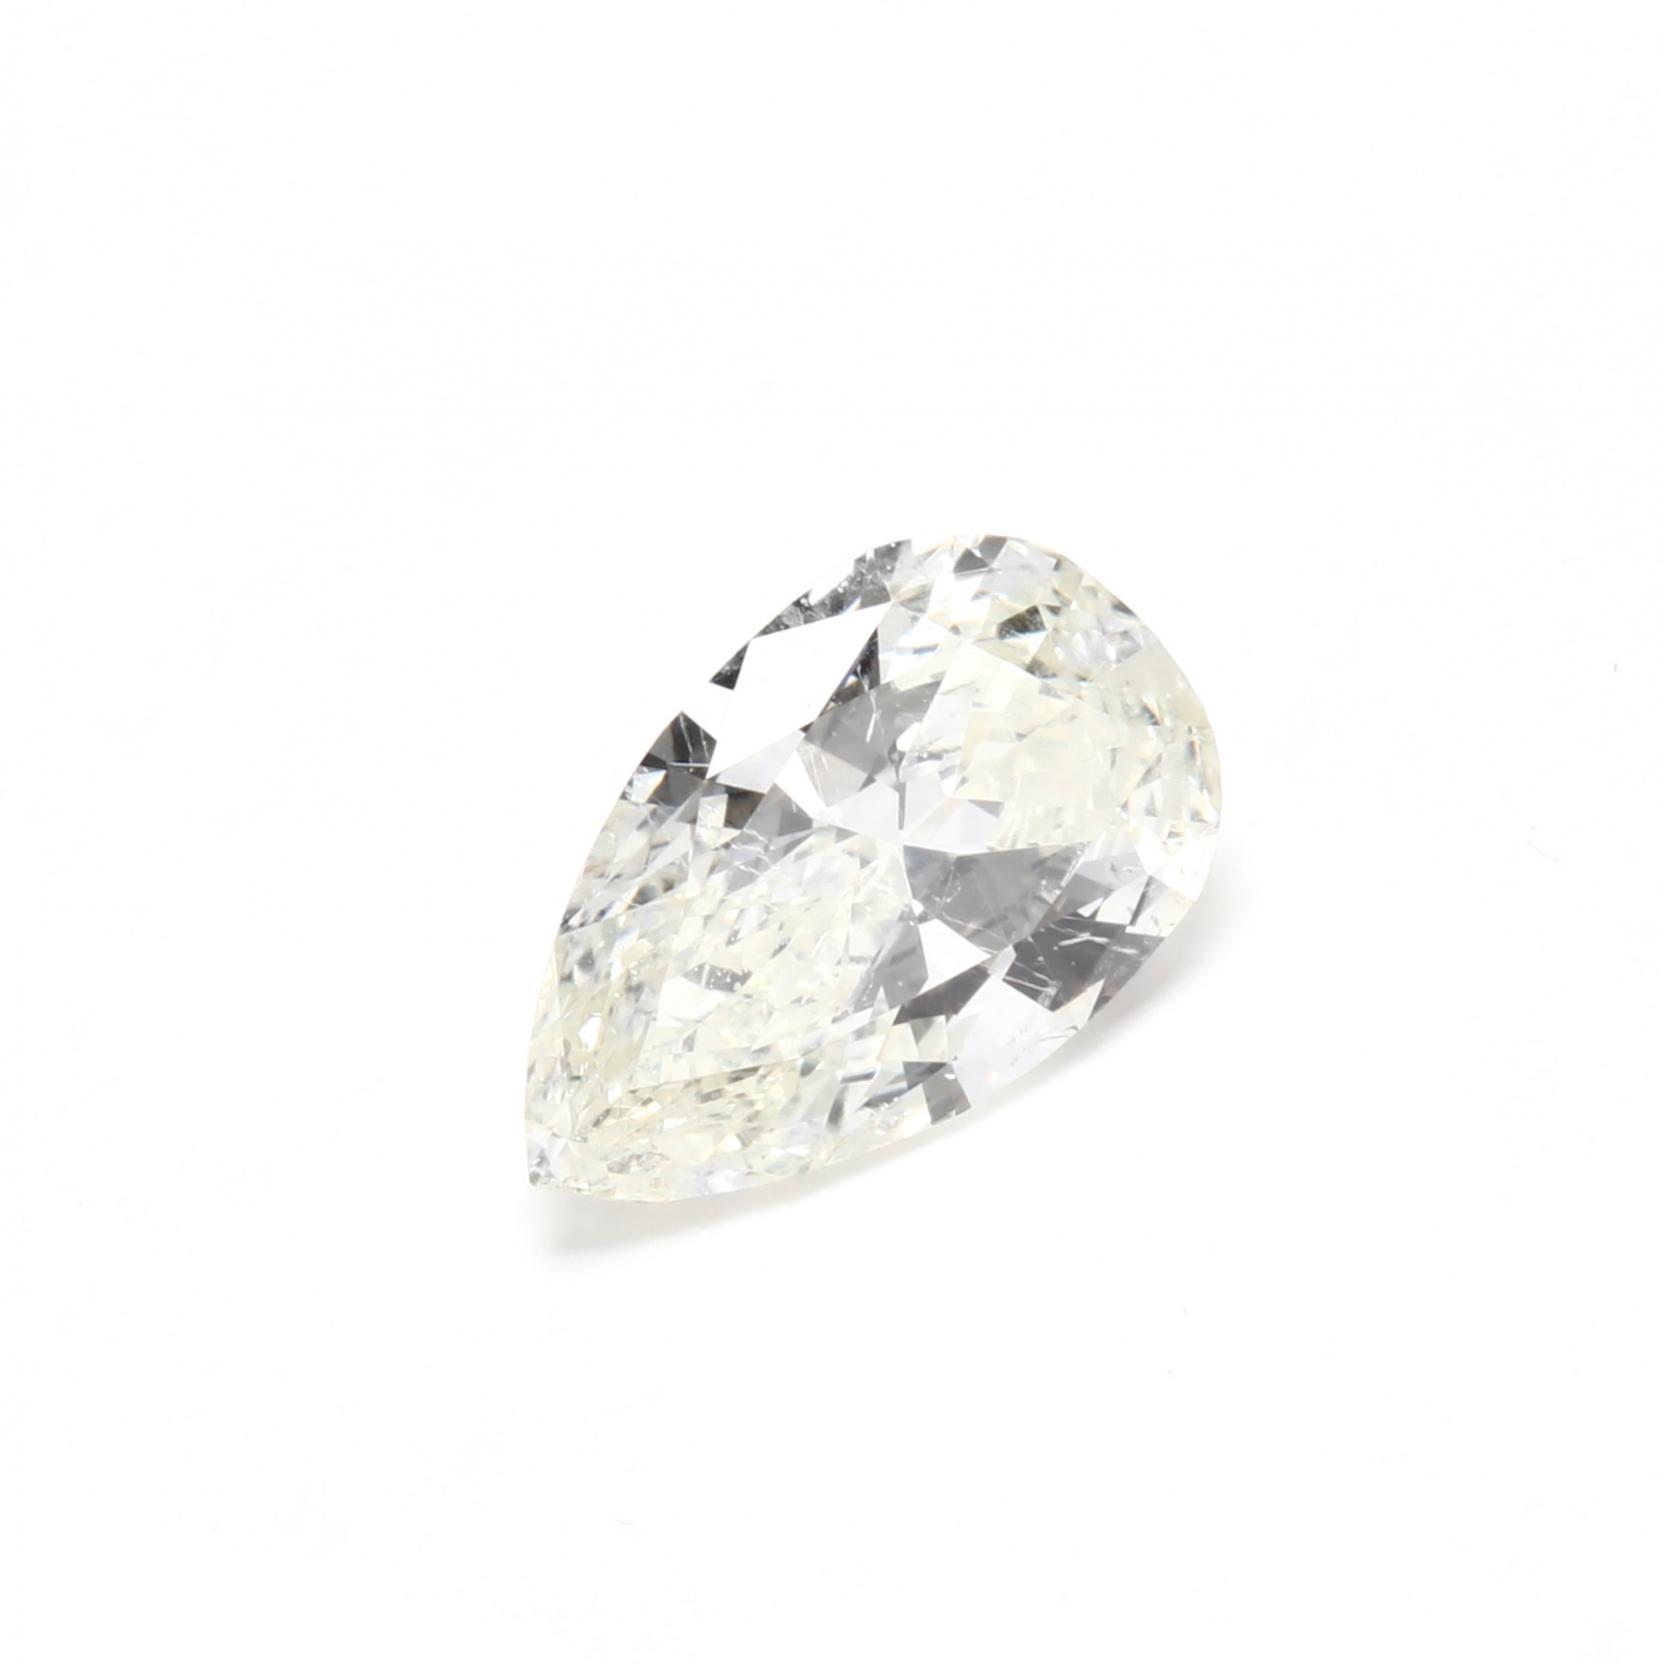 loose-pear-cut-diamond